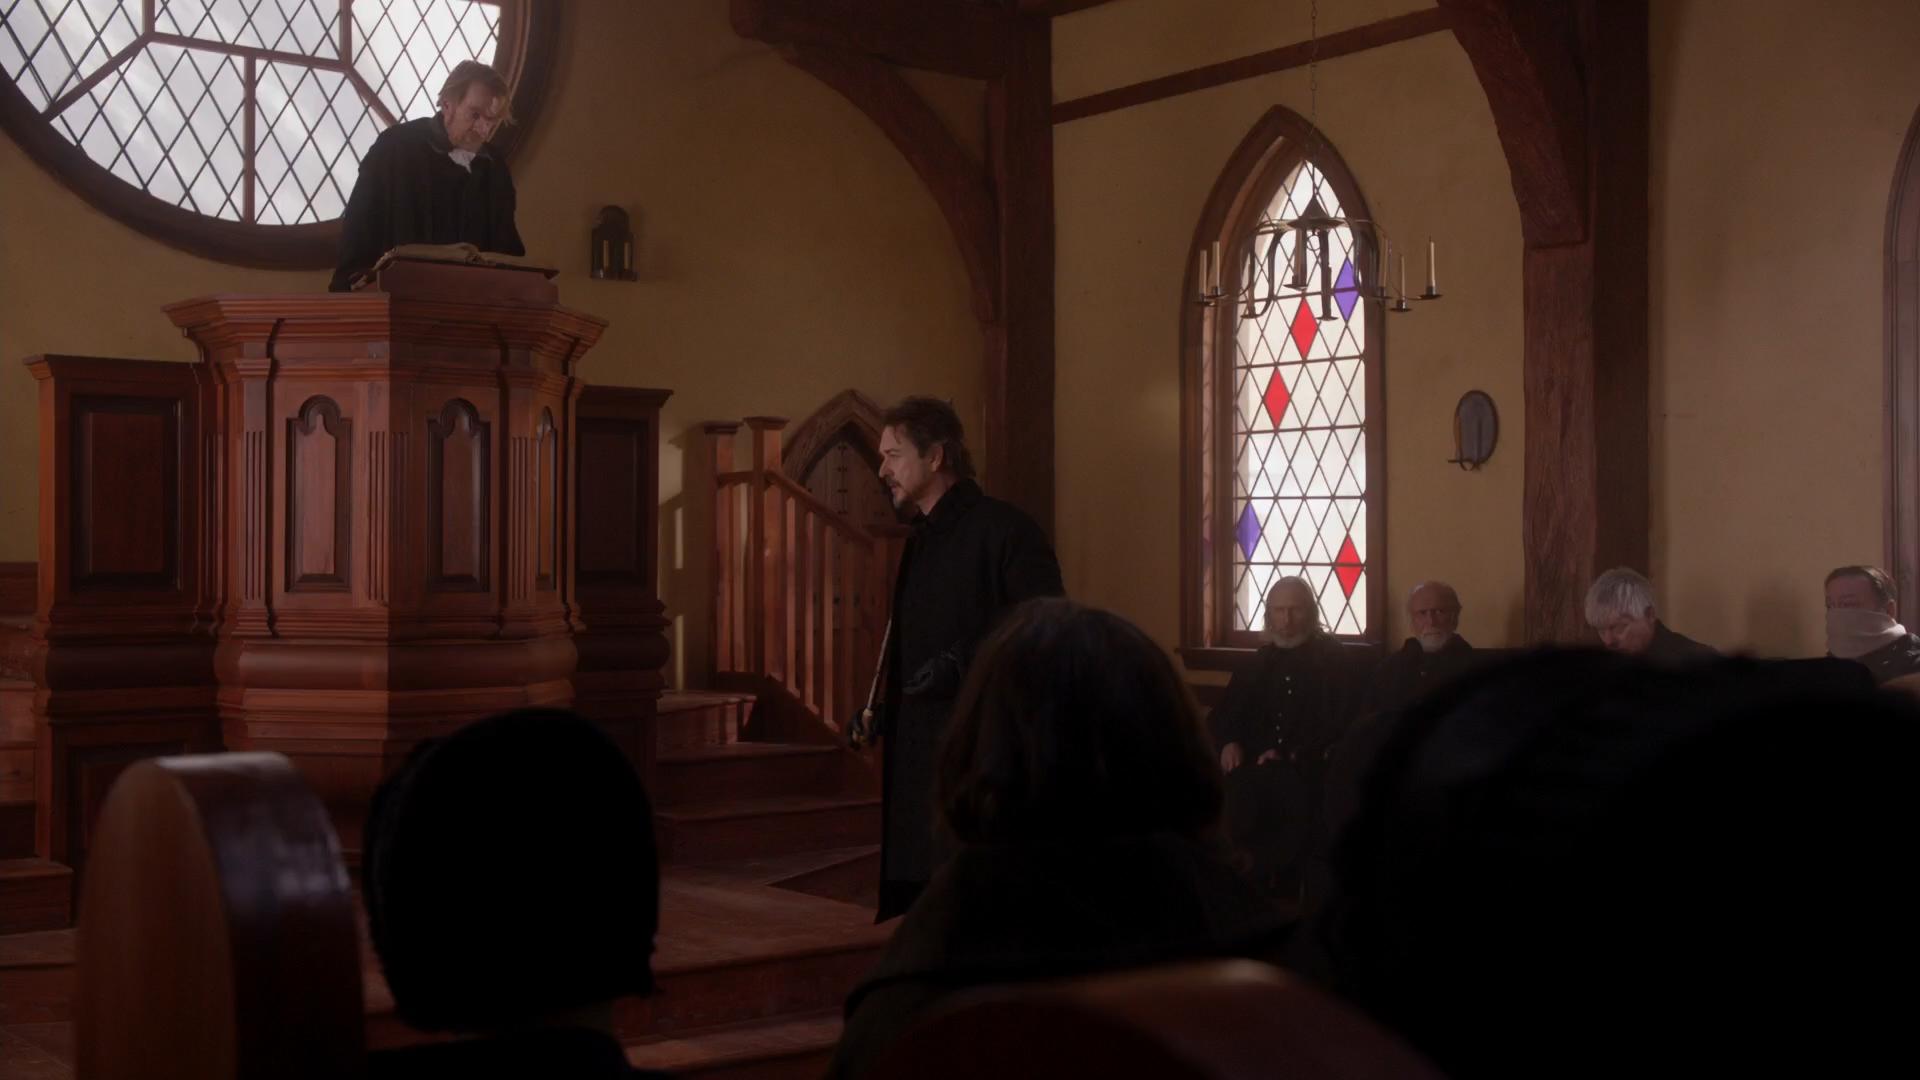 Салем / Salem [02x01-06 из 13] (2015) WEB-DL 1080p | LostFilm, NewStudio, AlexFilm